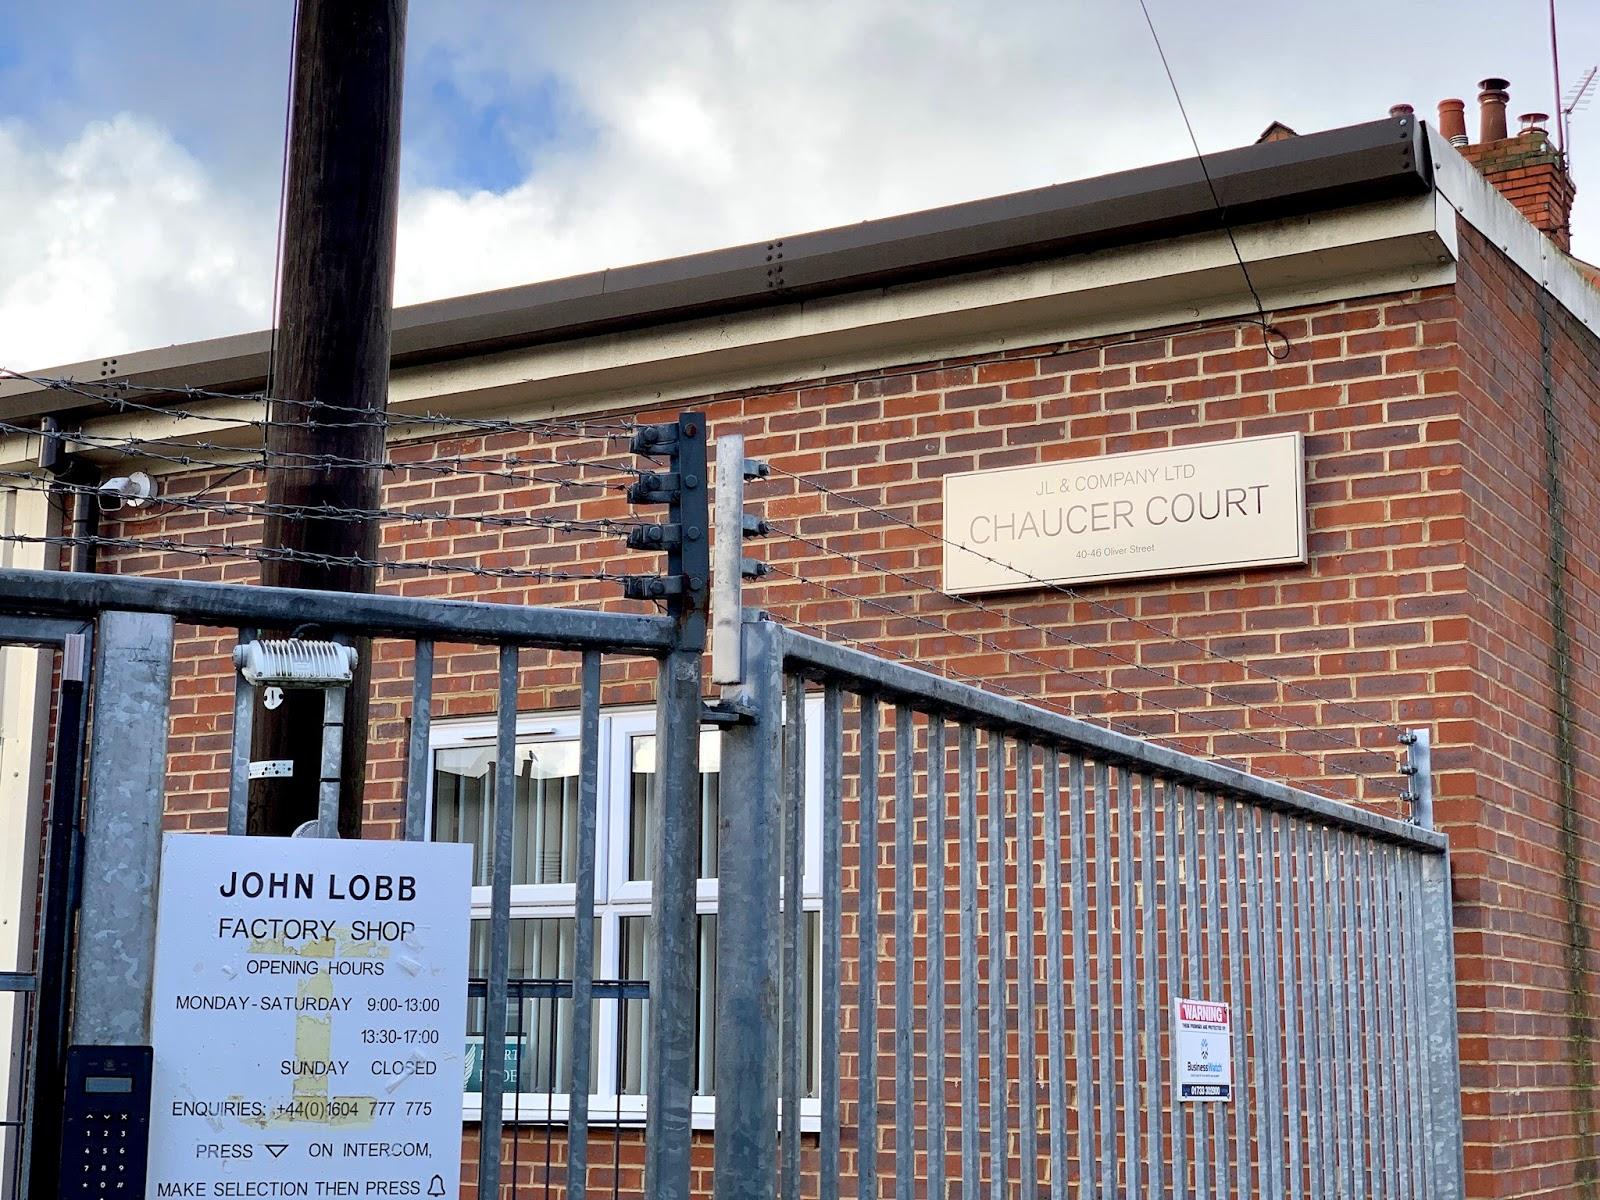 JOHN LOBB Entrance